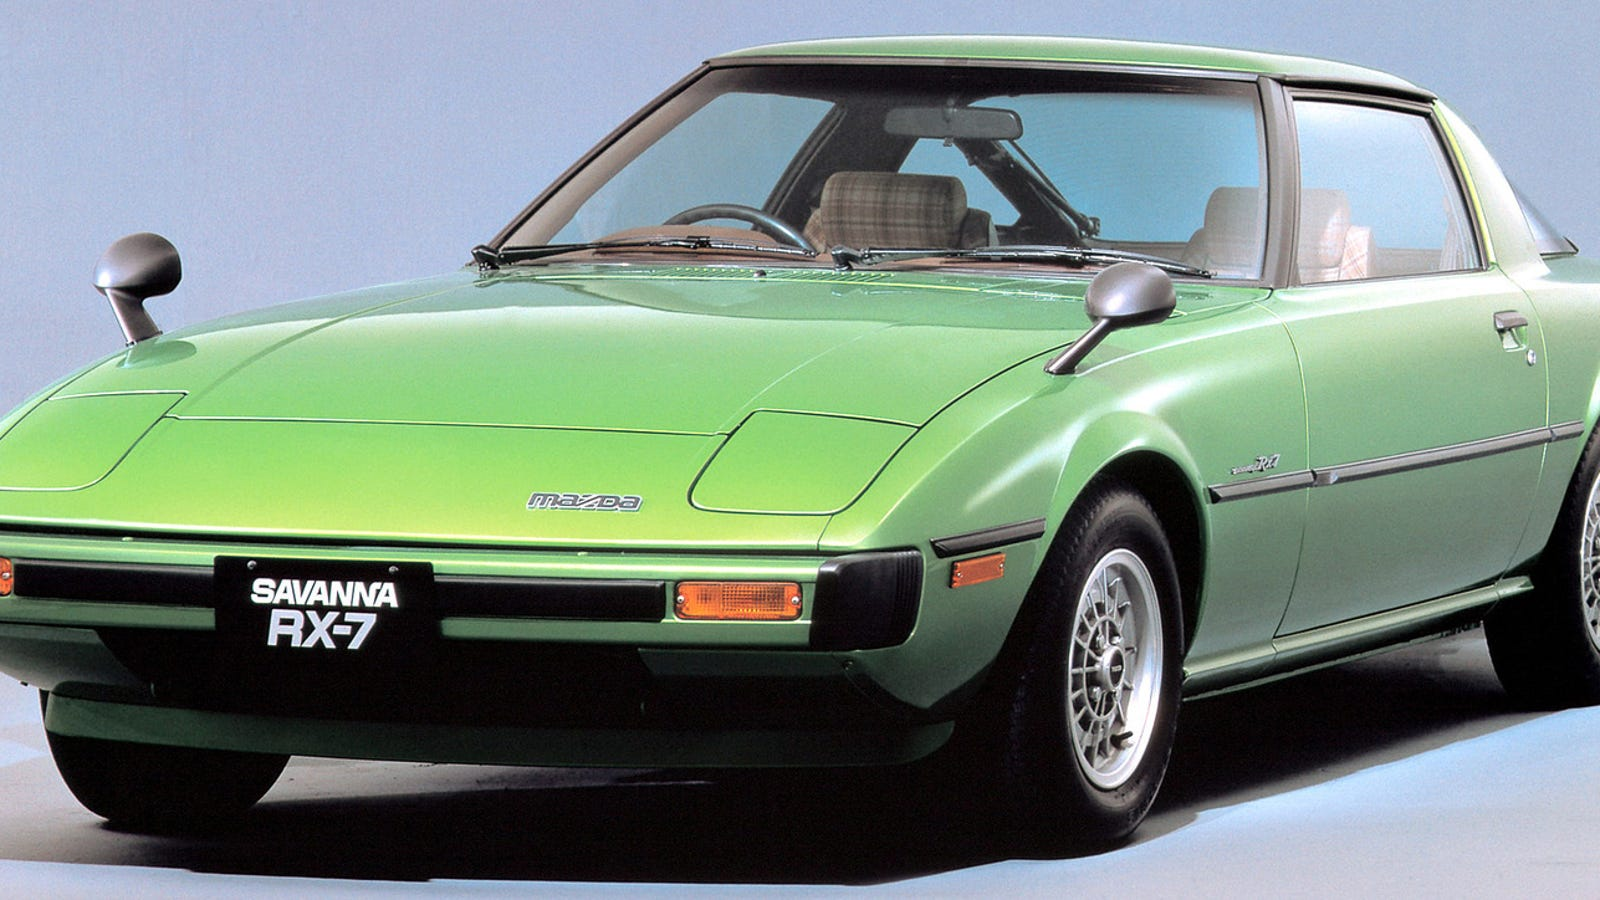 The Original Mazda RX-7 Is A Goddamn Masterpiece